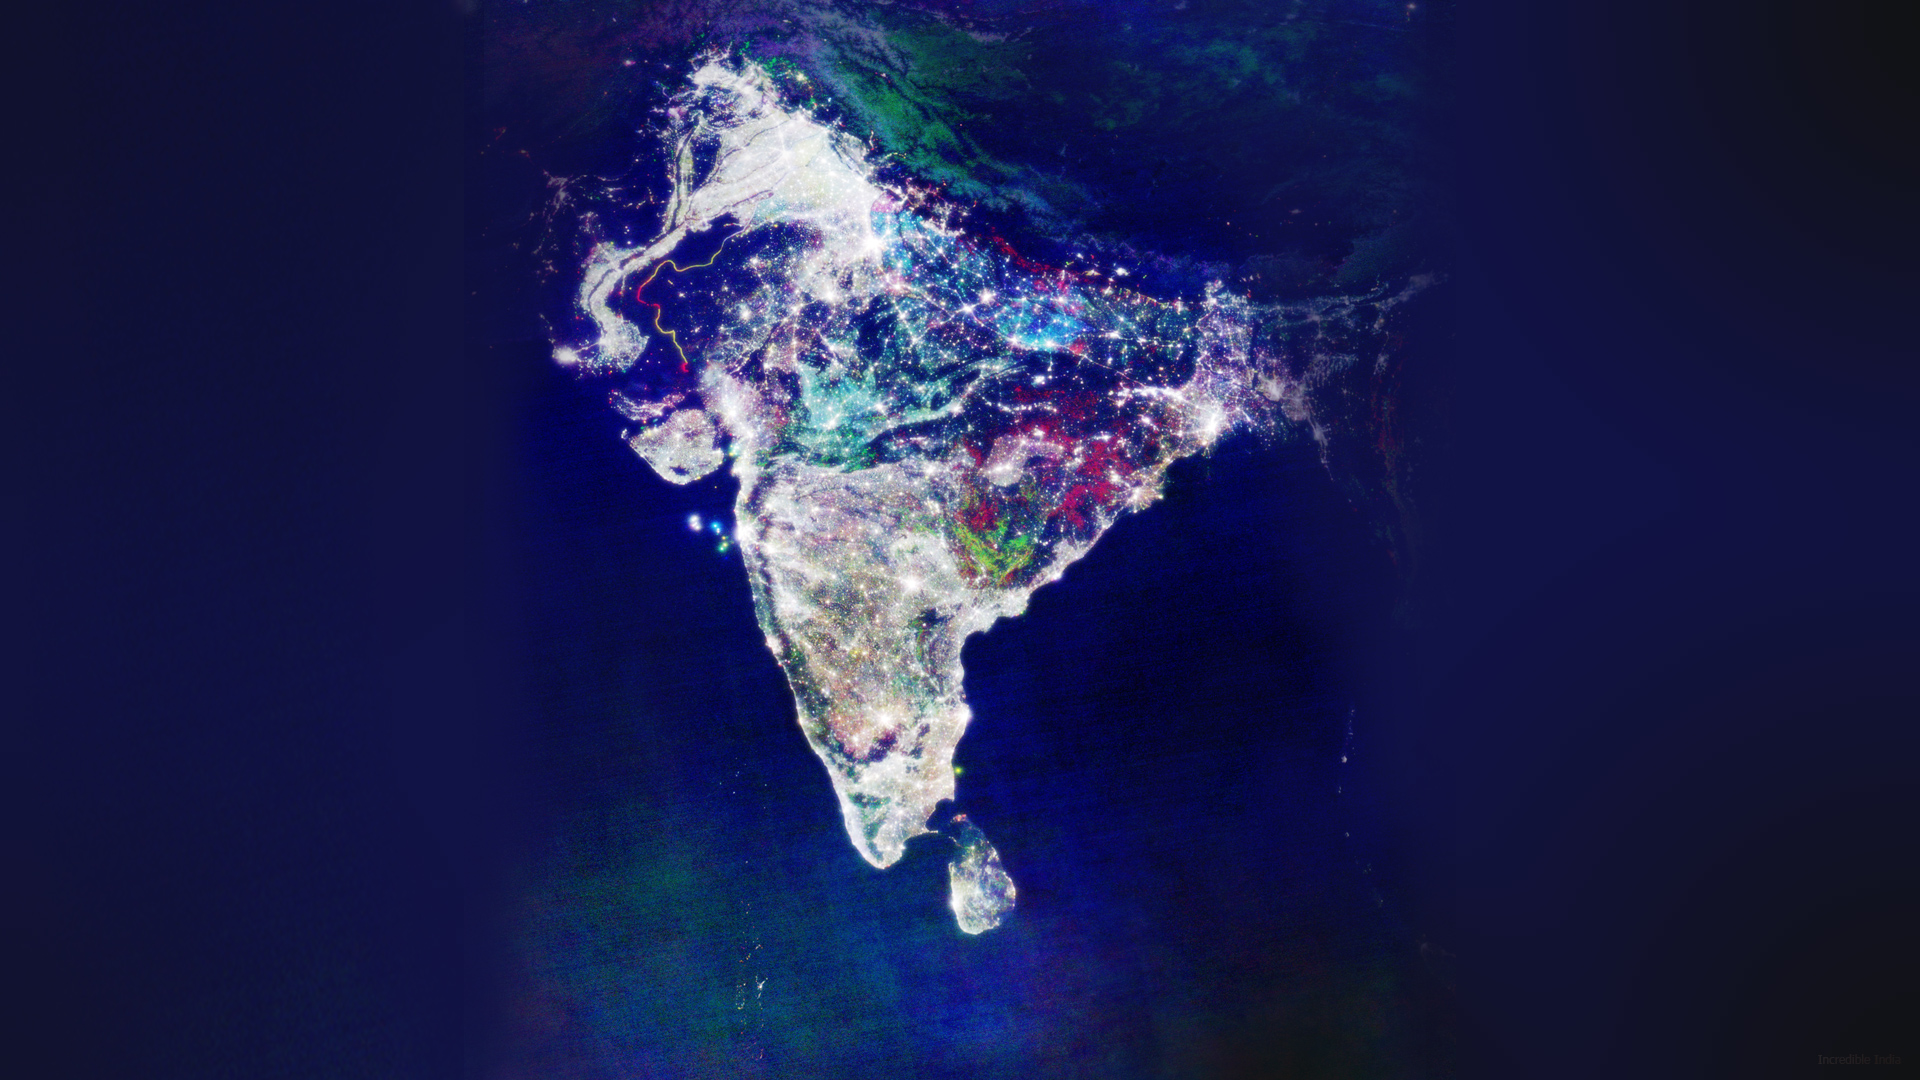 Hd wallpaper indian - India Hd Wallpapers Full Hd Wallpapers Download 1080p Desktop